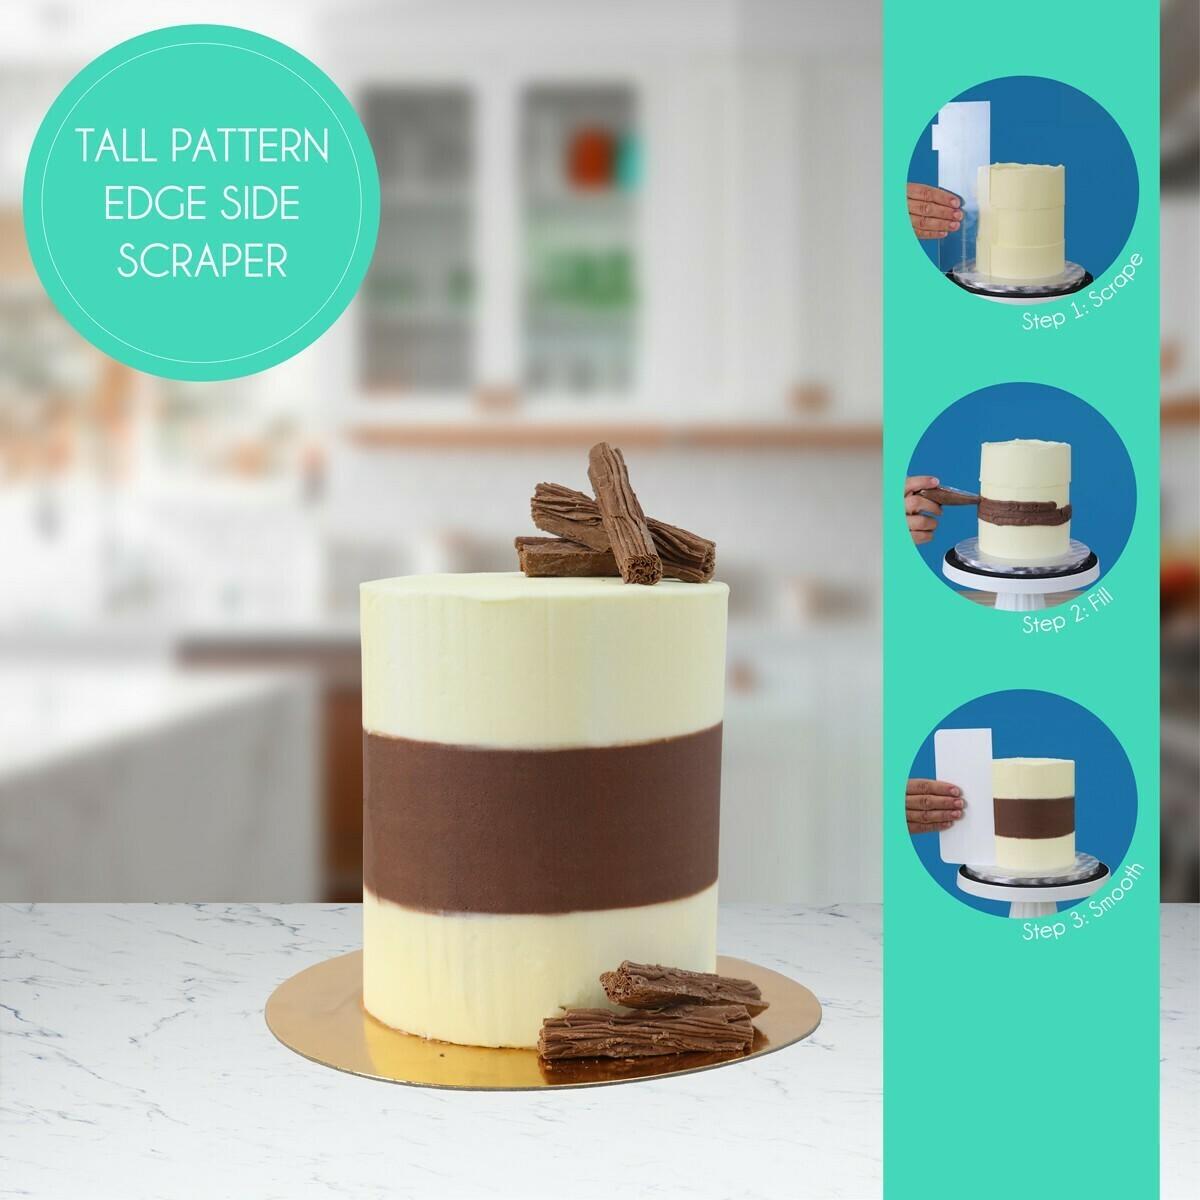 "PME Acrylic Side Scraper Latitude Ring For 4"" & 6"" Tall Cakes - Σπάτουλα Ακρυλική για Κέικ Ύψους 10εκ & 15εκ"